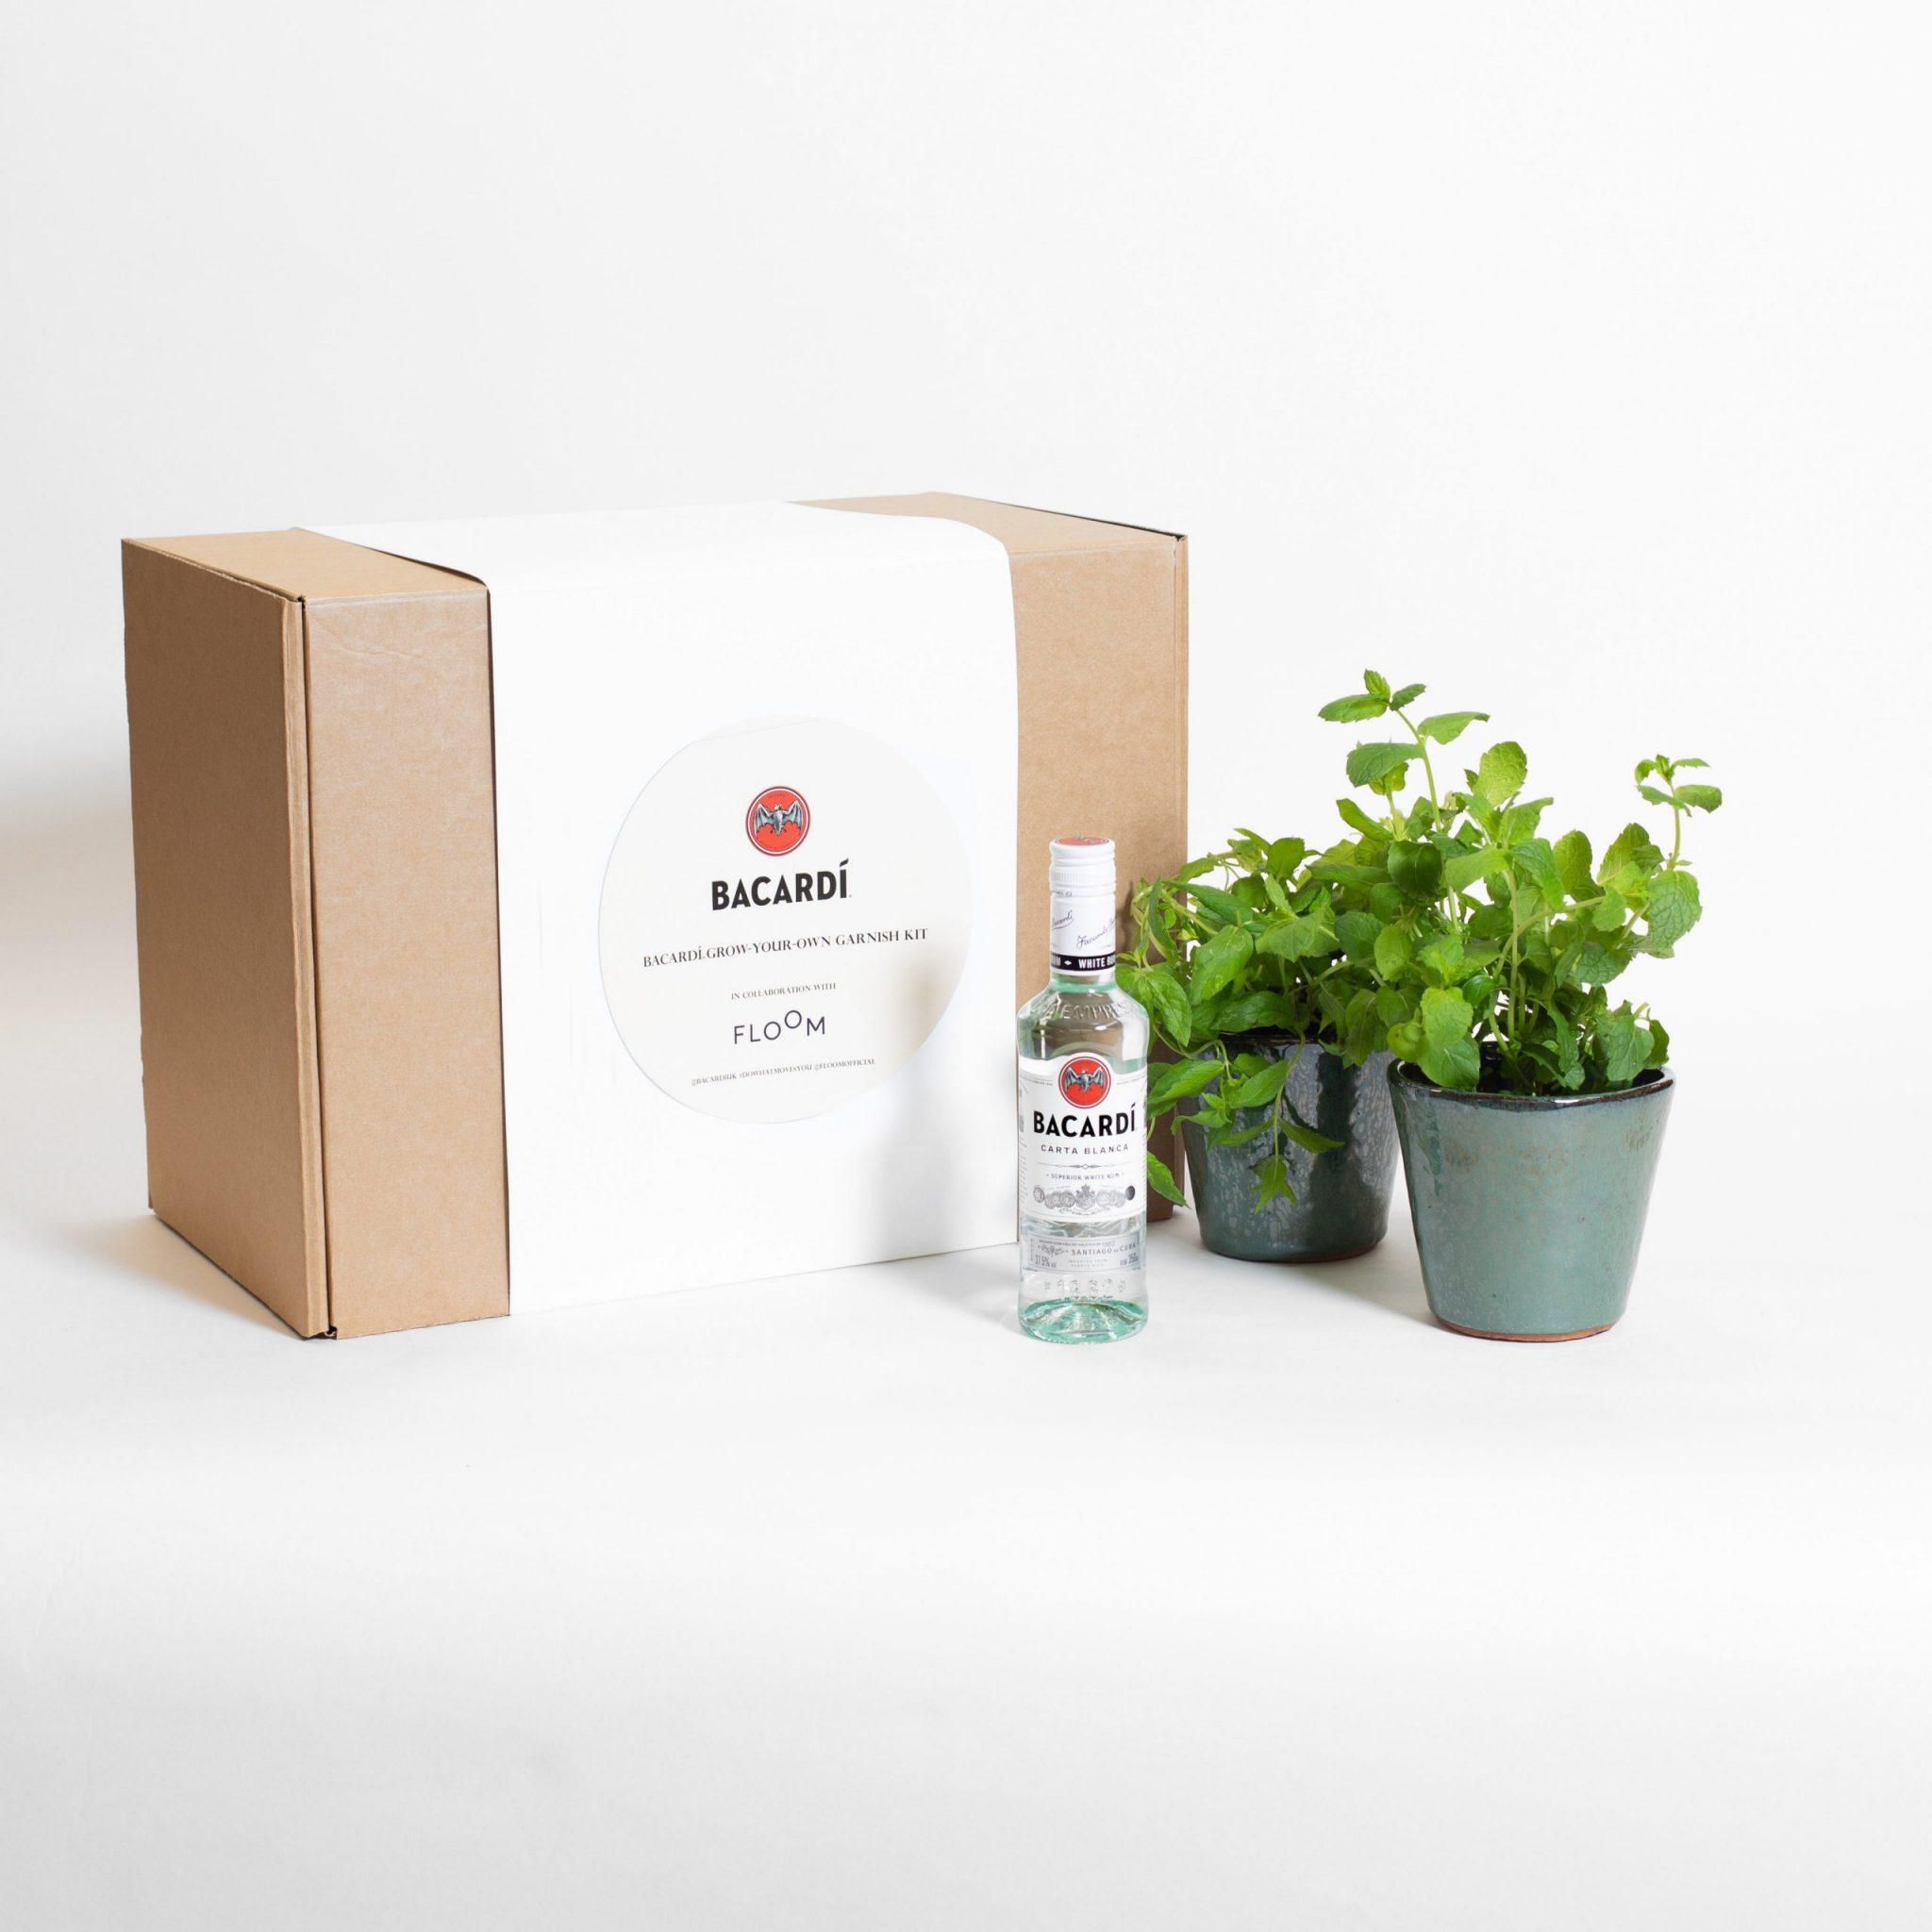 floom-oglivy-bacardi-productl-FINAL